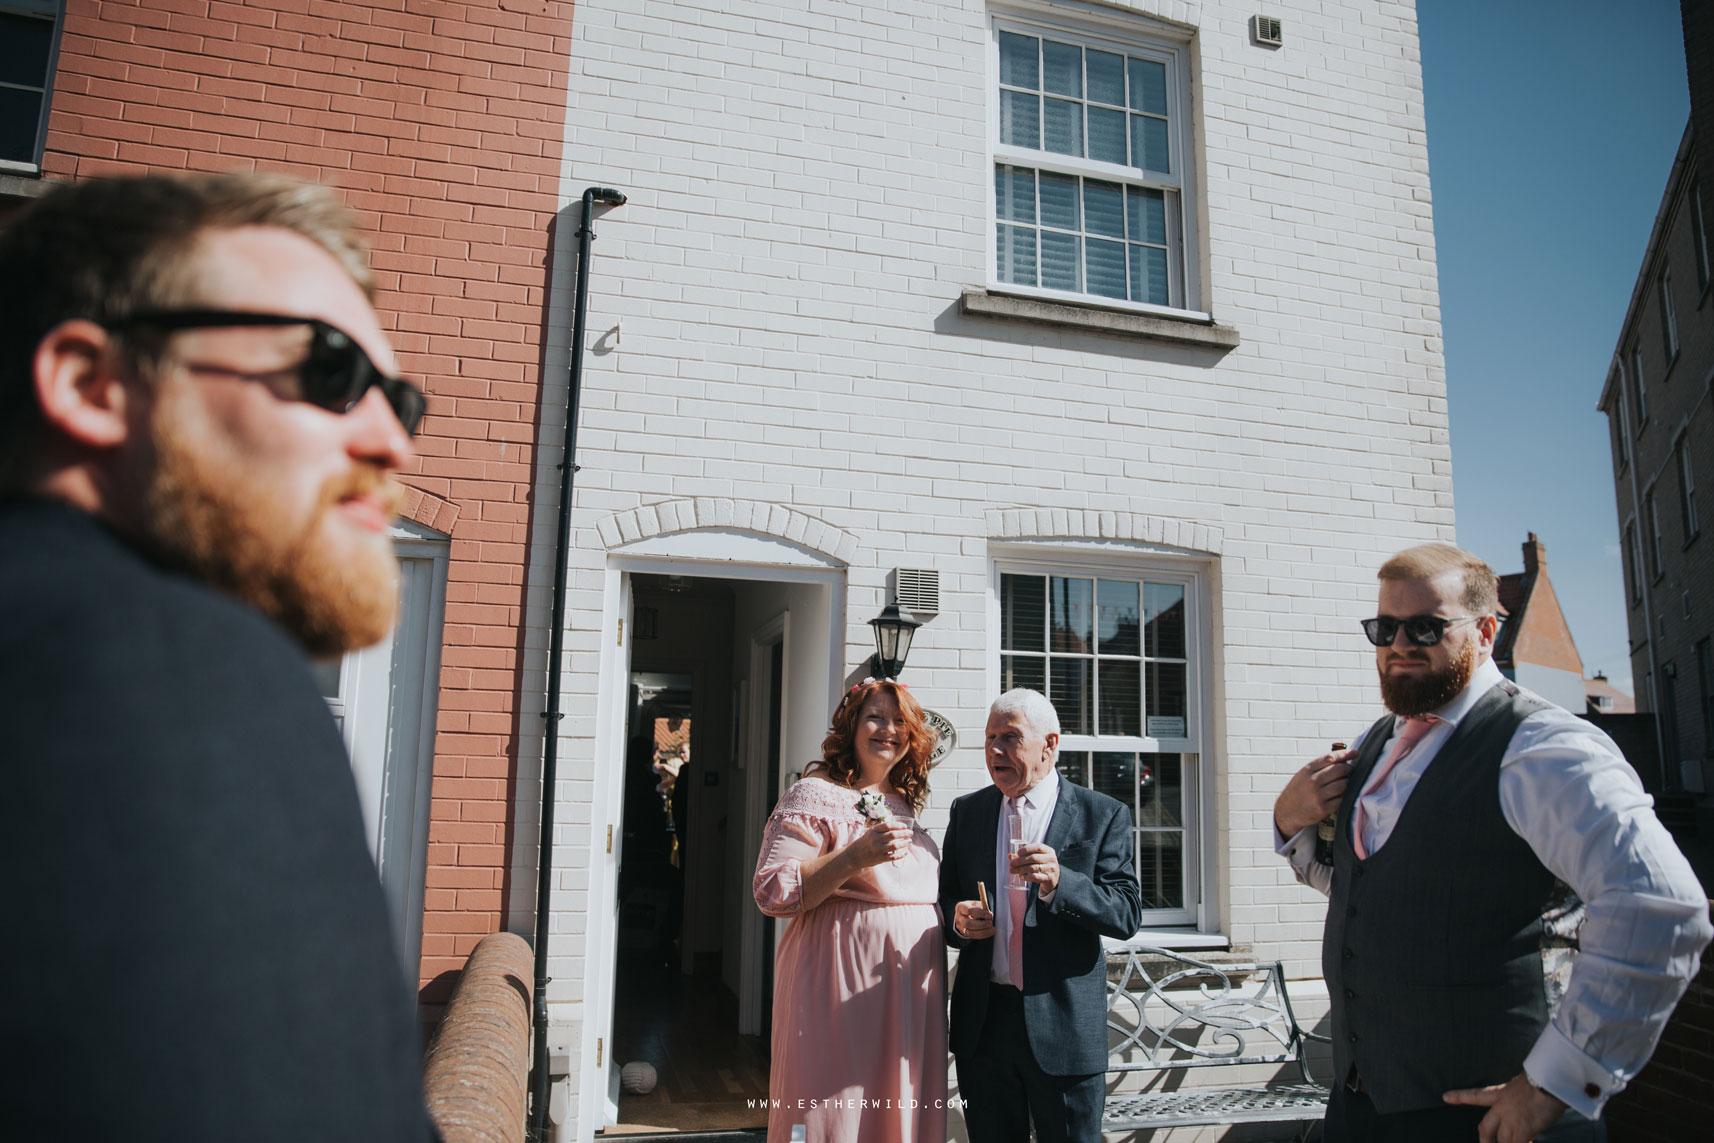 Cromer_Wedding_Beach_Outdoor_Ceremony_Norfolk_North_Lodge_Registry_Office_Rocket_House_Cafe_Cromer_Pier_IMG_3420_IMGL7593.jpg